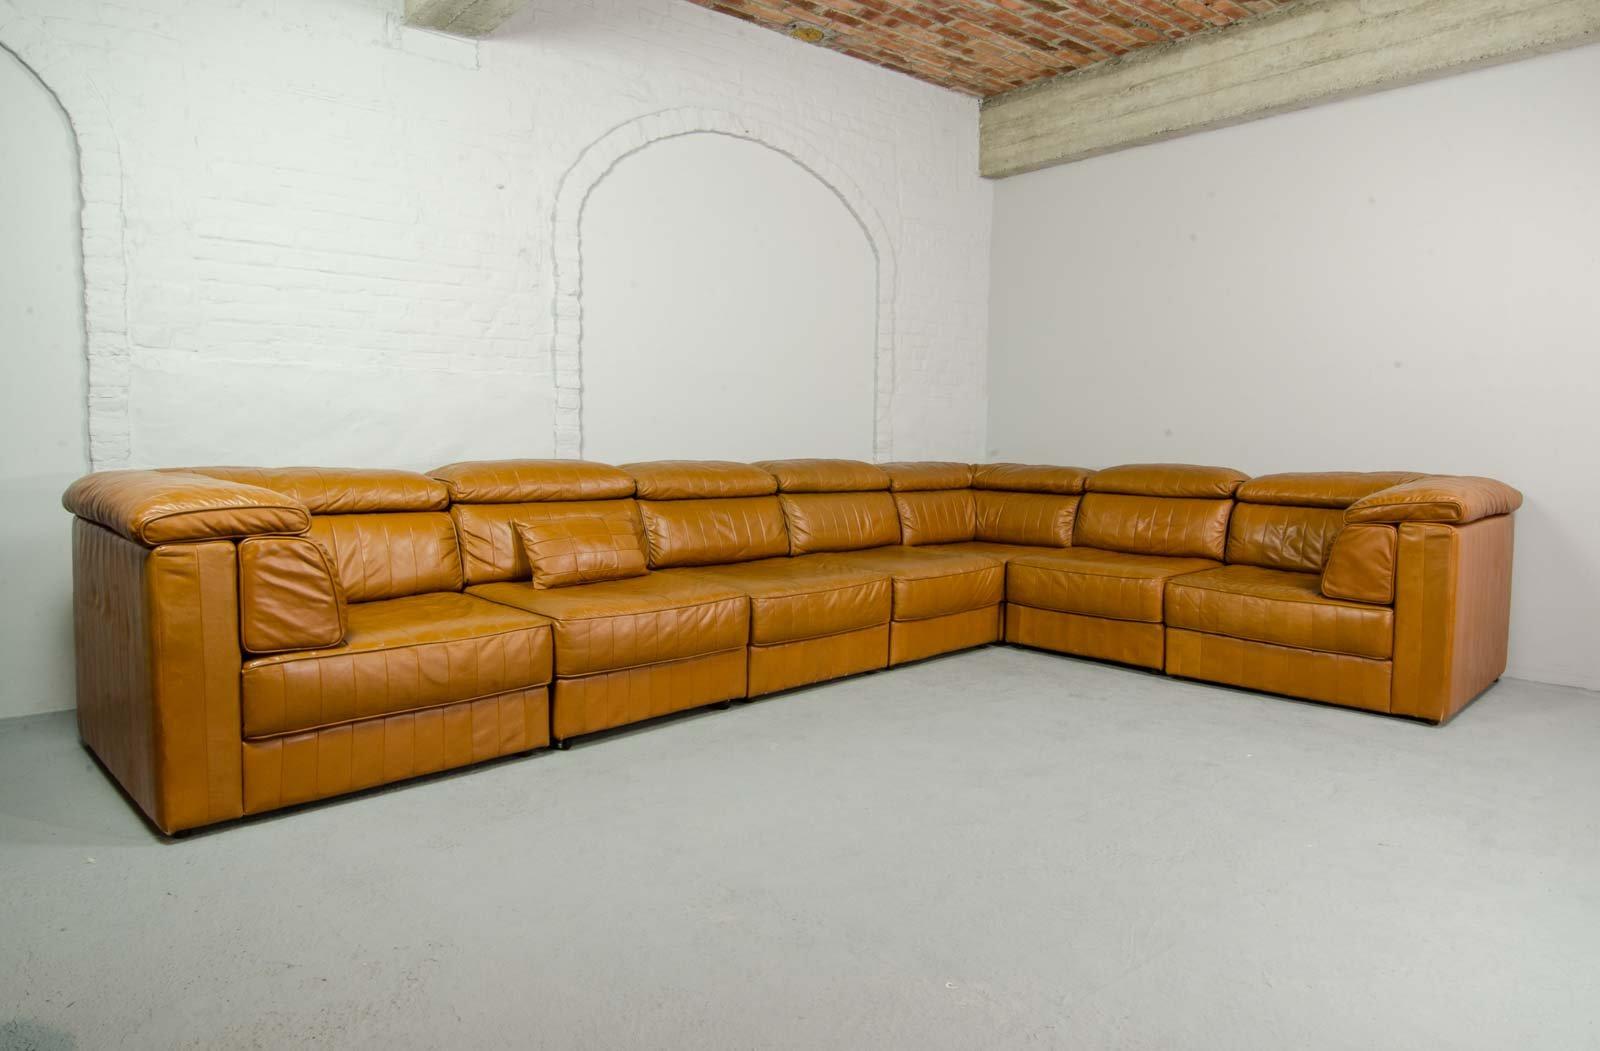 modulares mid century patchwork sofa von laauser 1970er. Black Bedroom Furniture Sets. Home Design Ideas